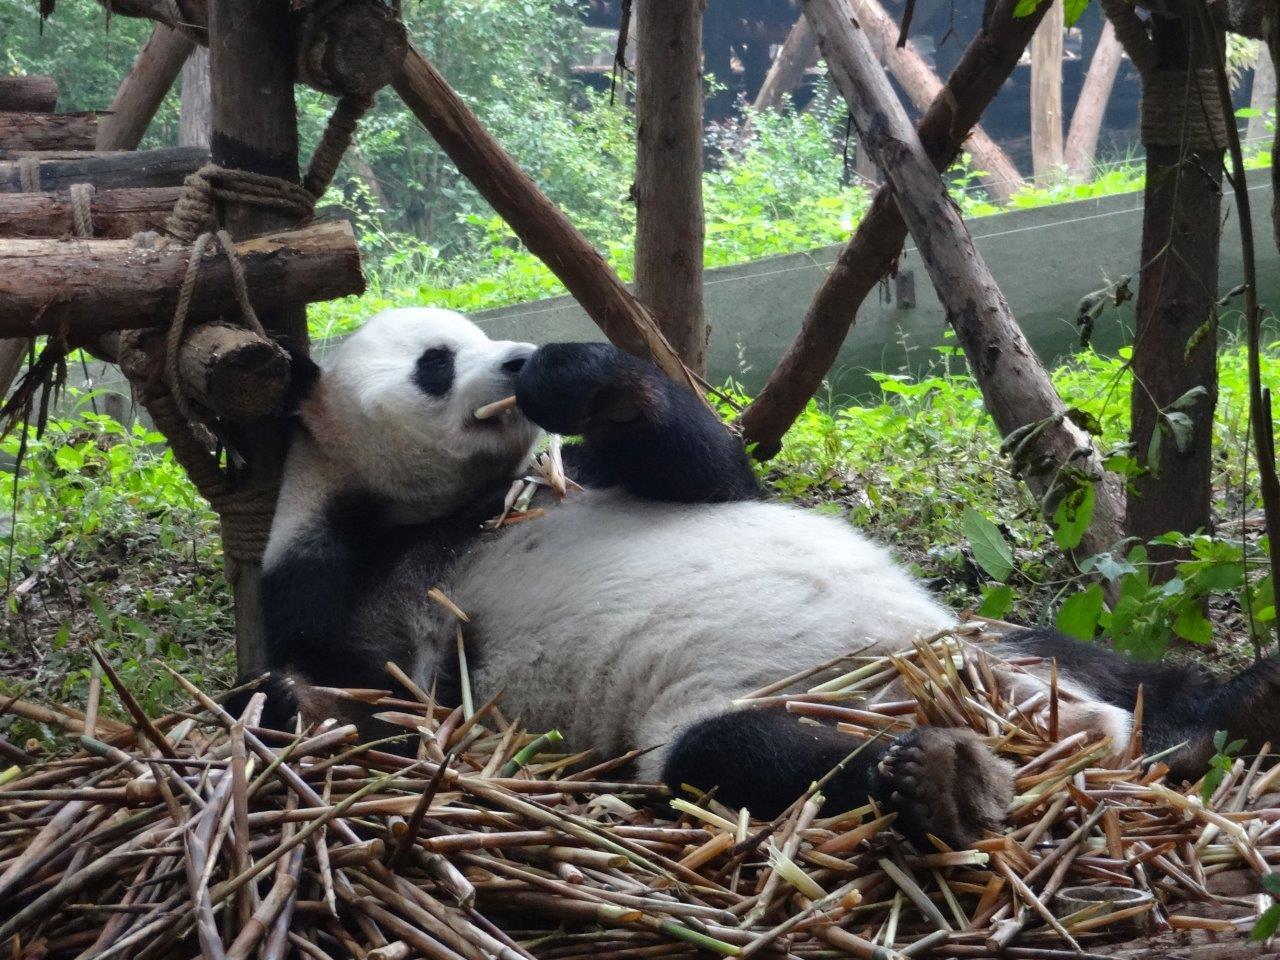 Panda Reserve Chengdu 2014 (4)